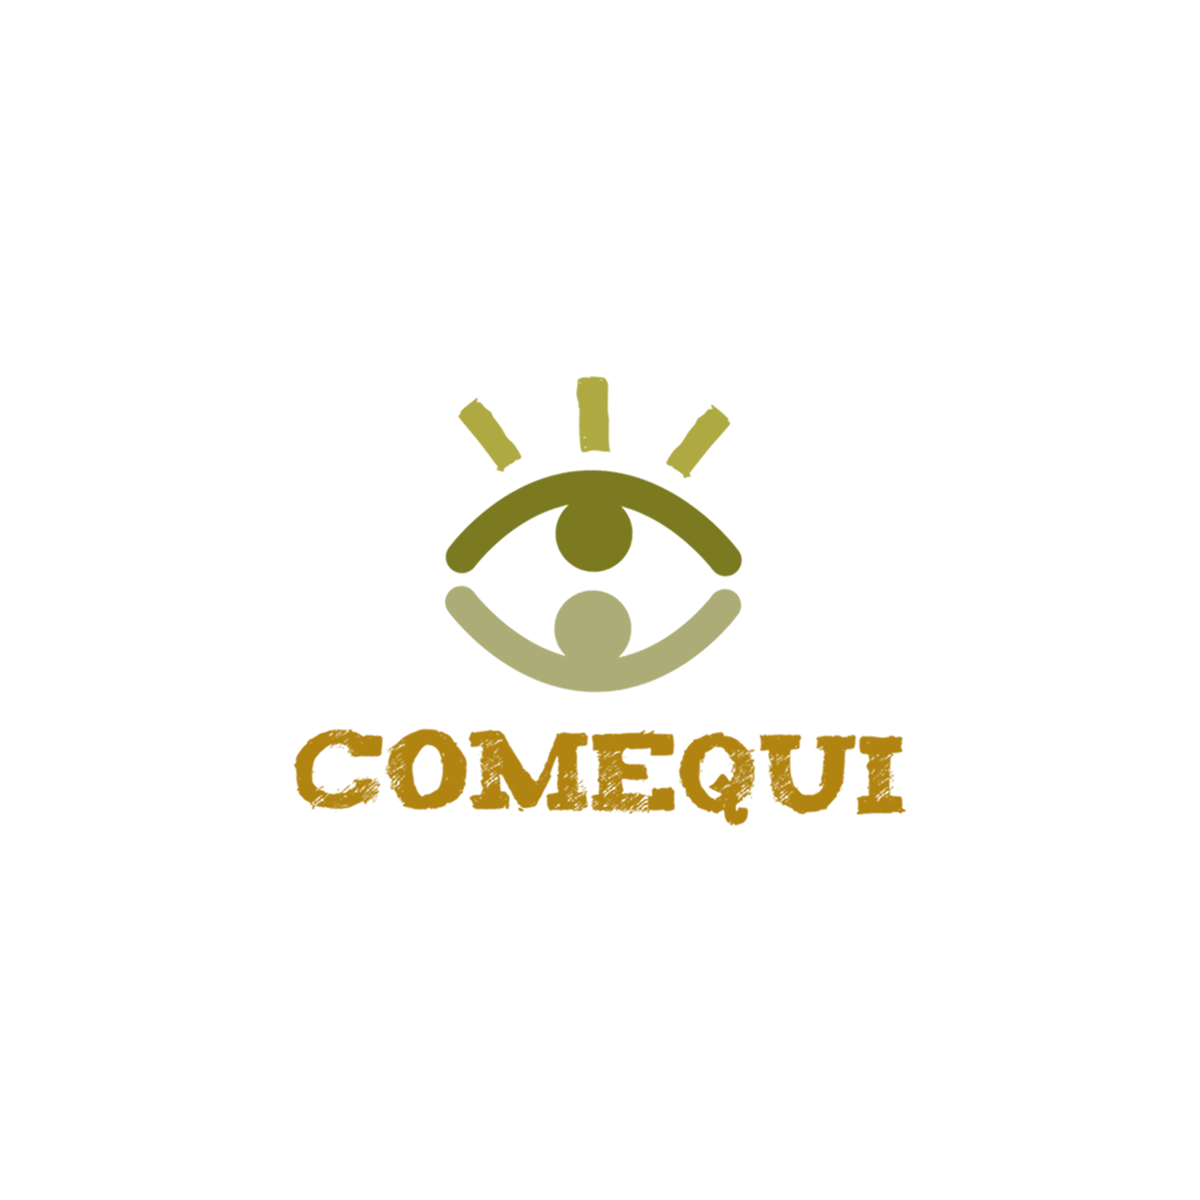 logo_comequi.png